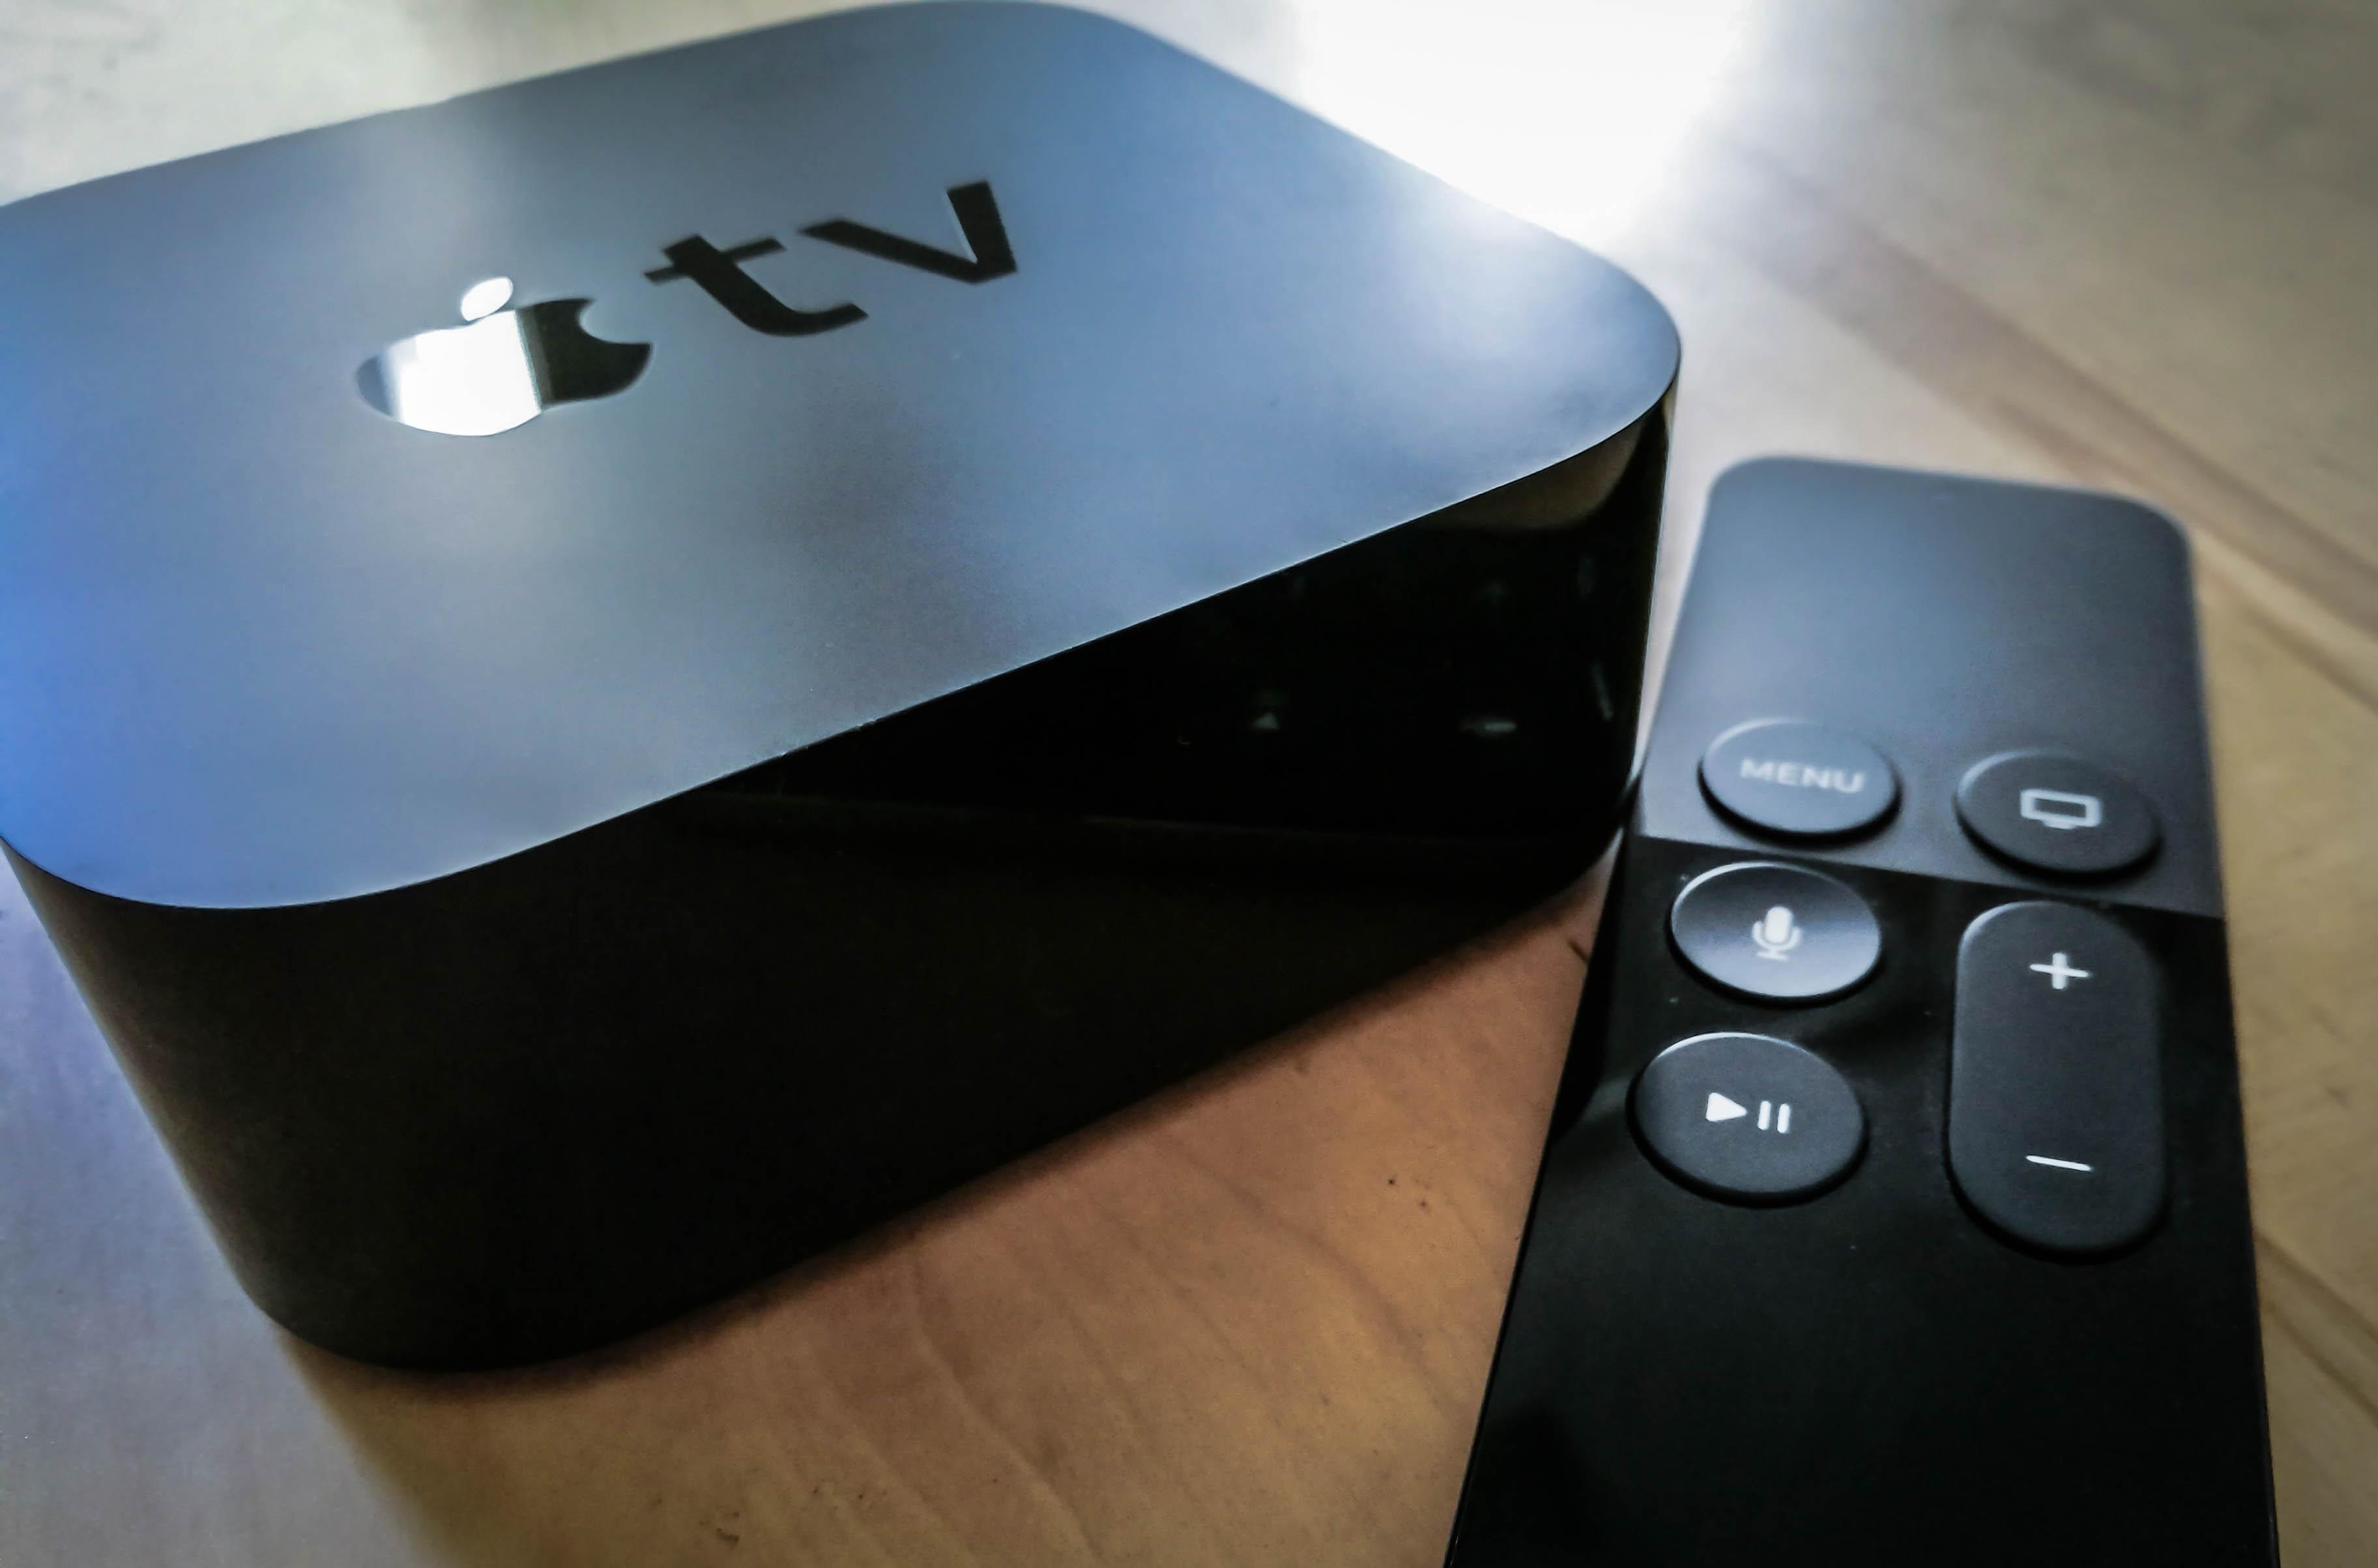 Source new apple tv will compete with amazon echo venturebeat - Tv und mediamobel ...